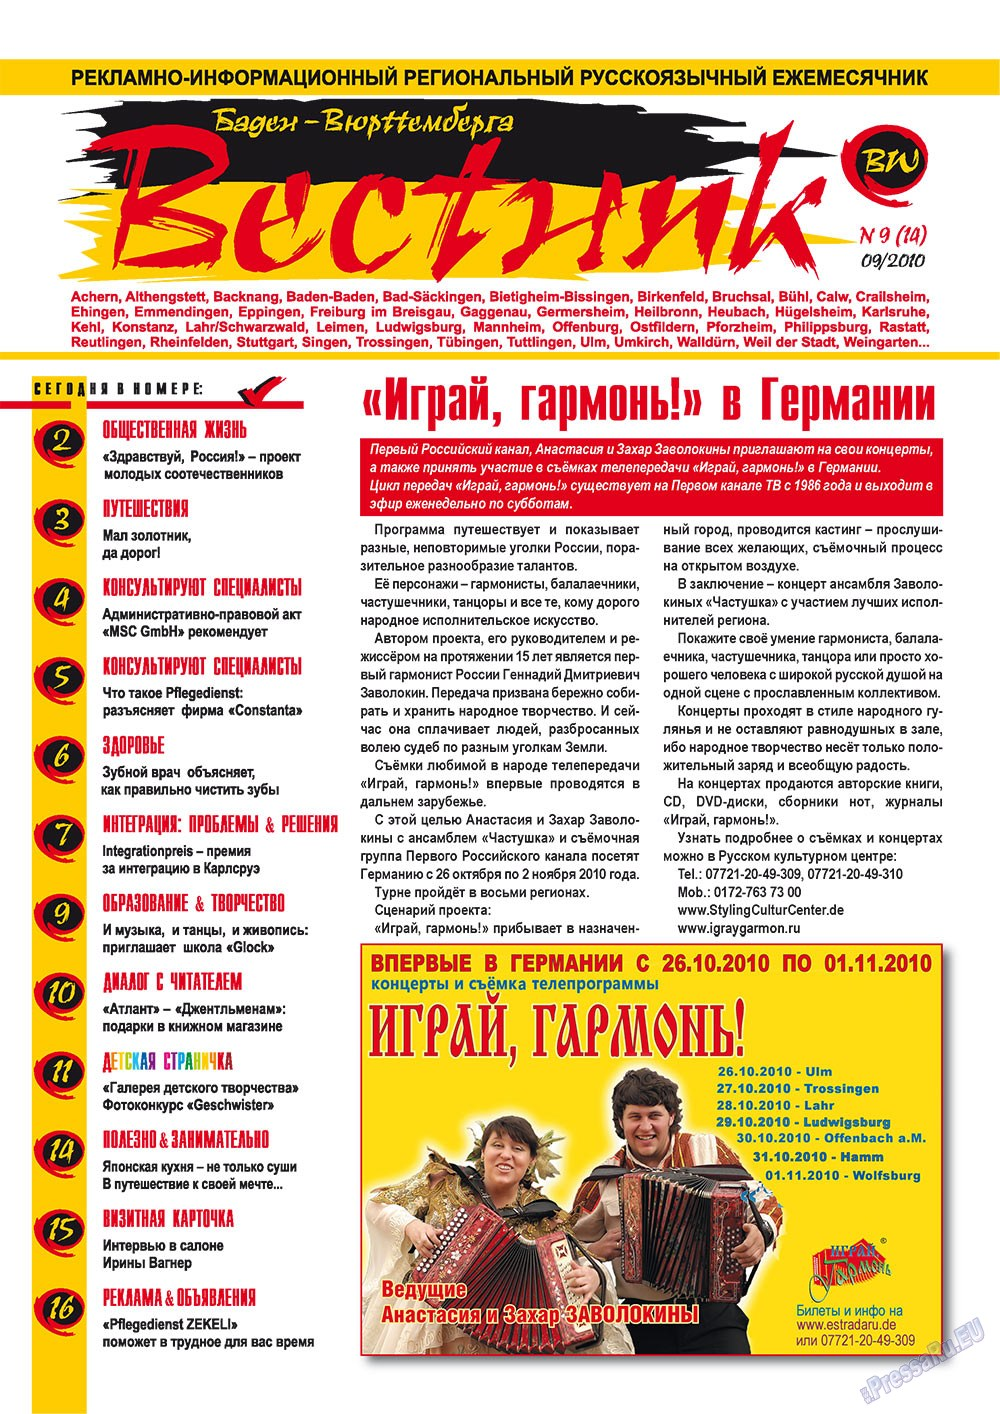 Вестник-info (журнал). 2010 год, номер 9, стр. 1